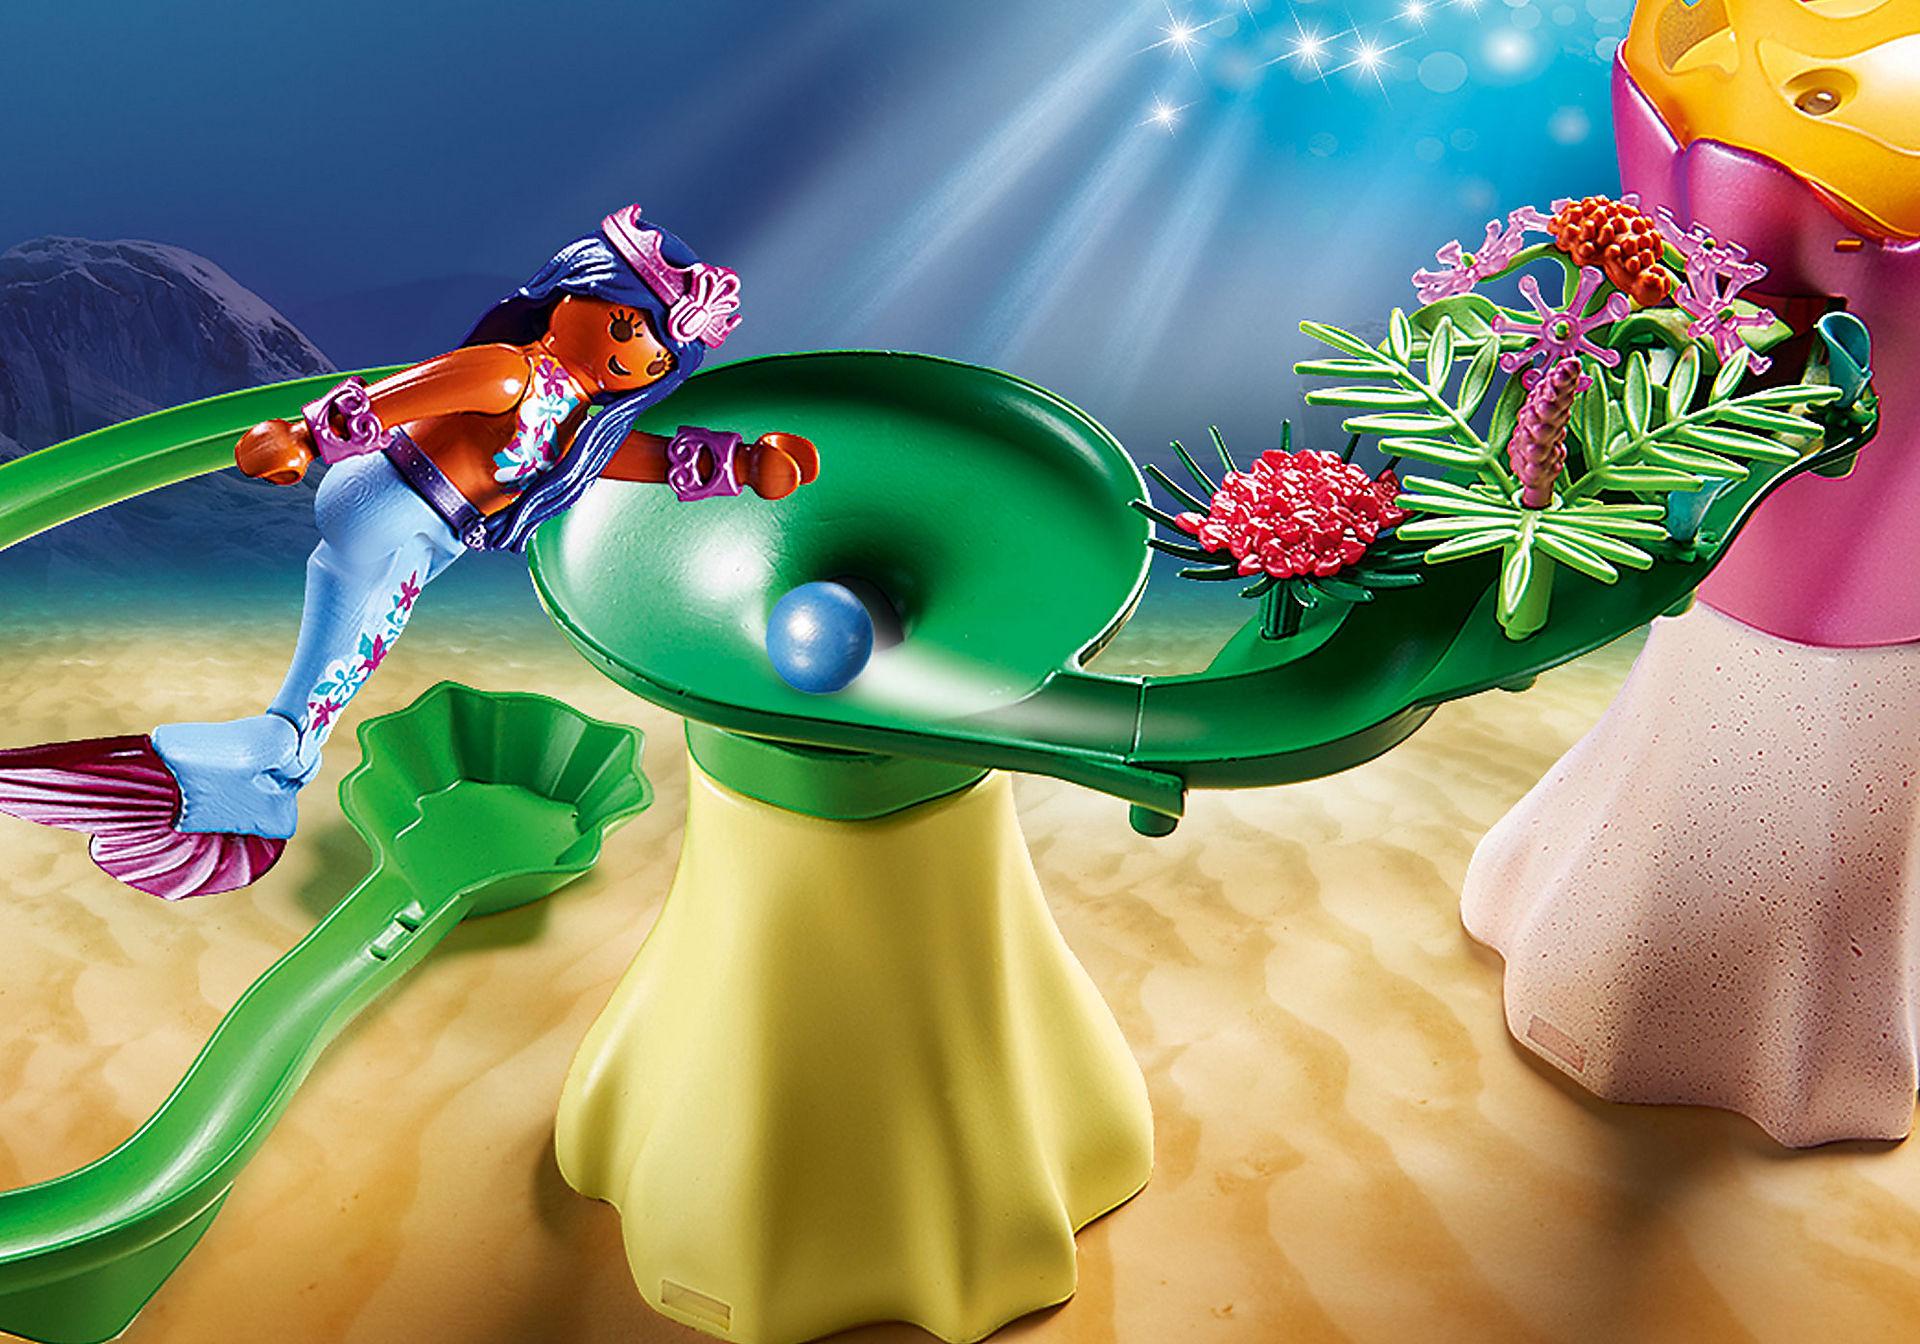 70094 Cala de Sirenas con Cúpula Iluminada zoom image8